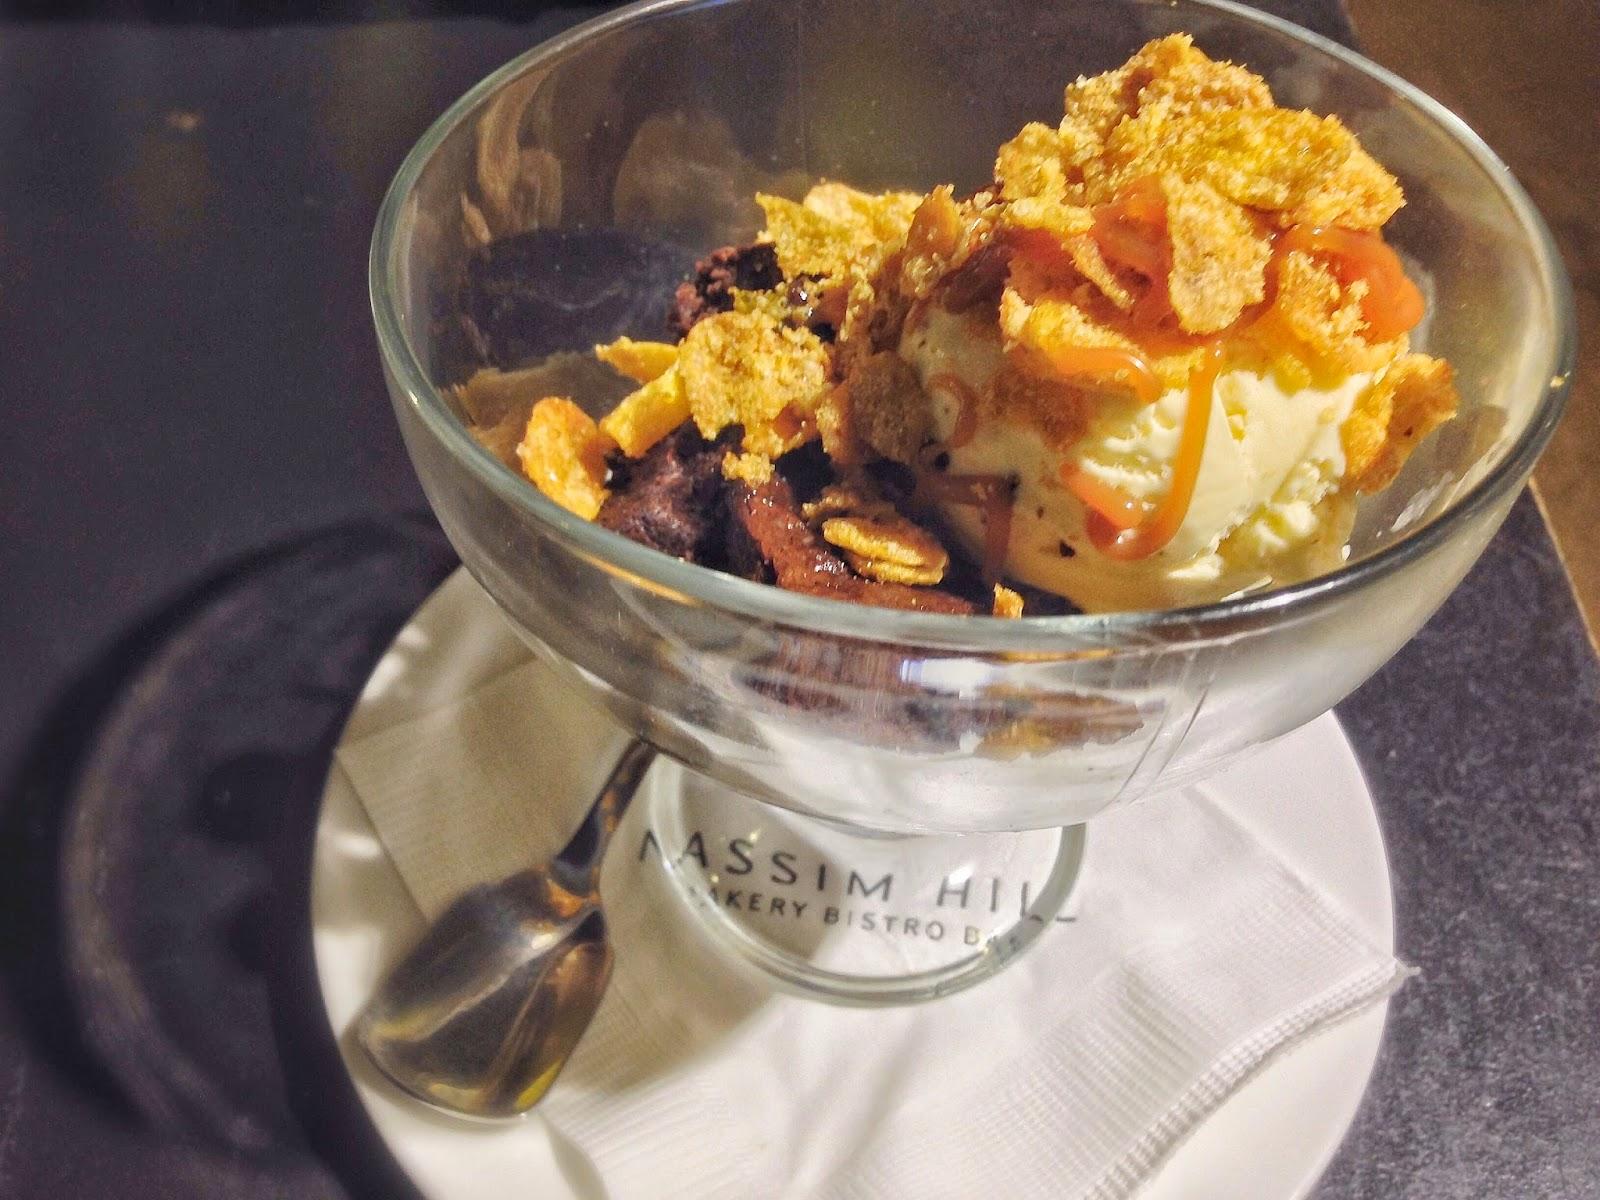 Brownie Parfait with Caramelised Corn Flakes, Salted Peanuts, Salted Caramel Sauce and Vanilla Ice-Cream ($10)